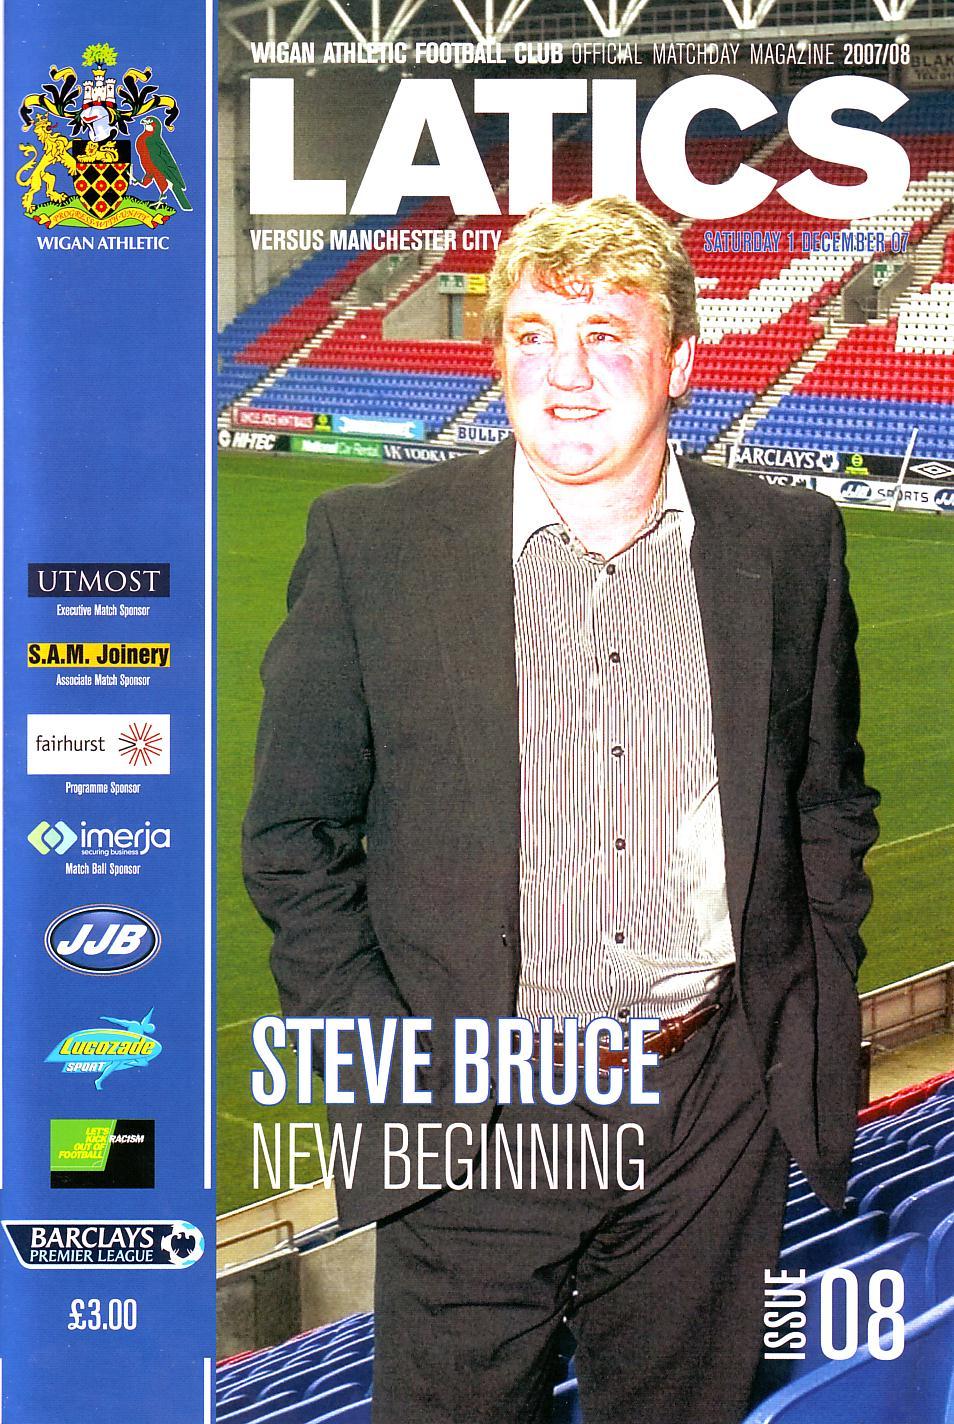 Wigan away 2007to08 prog